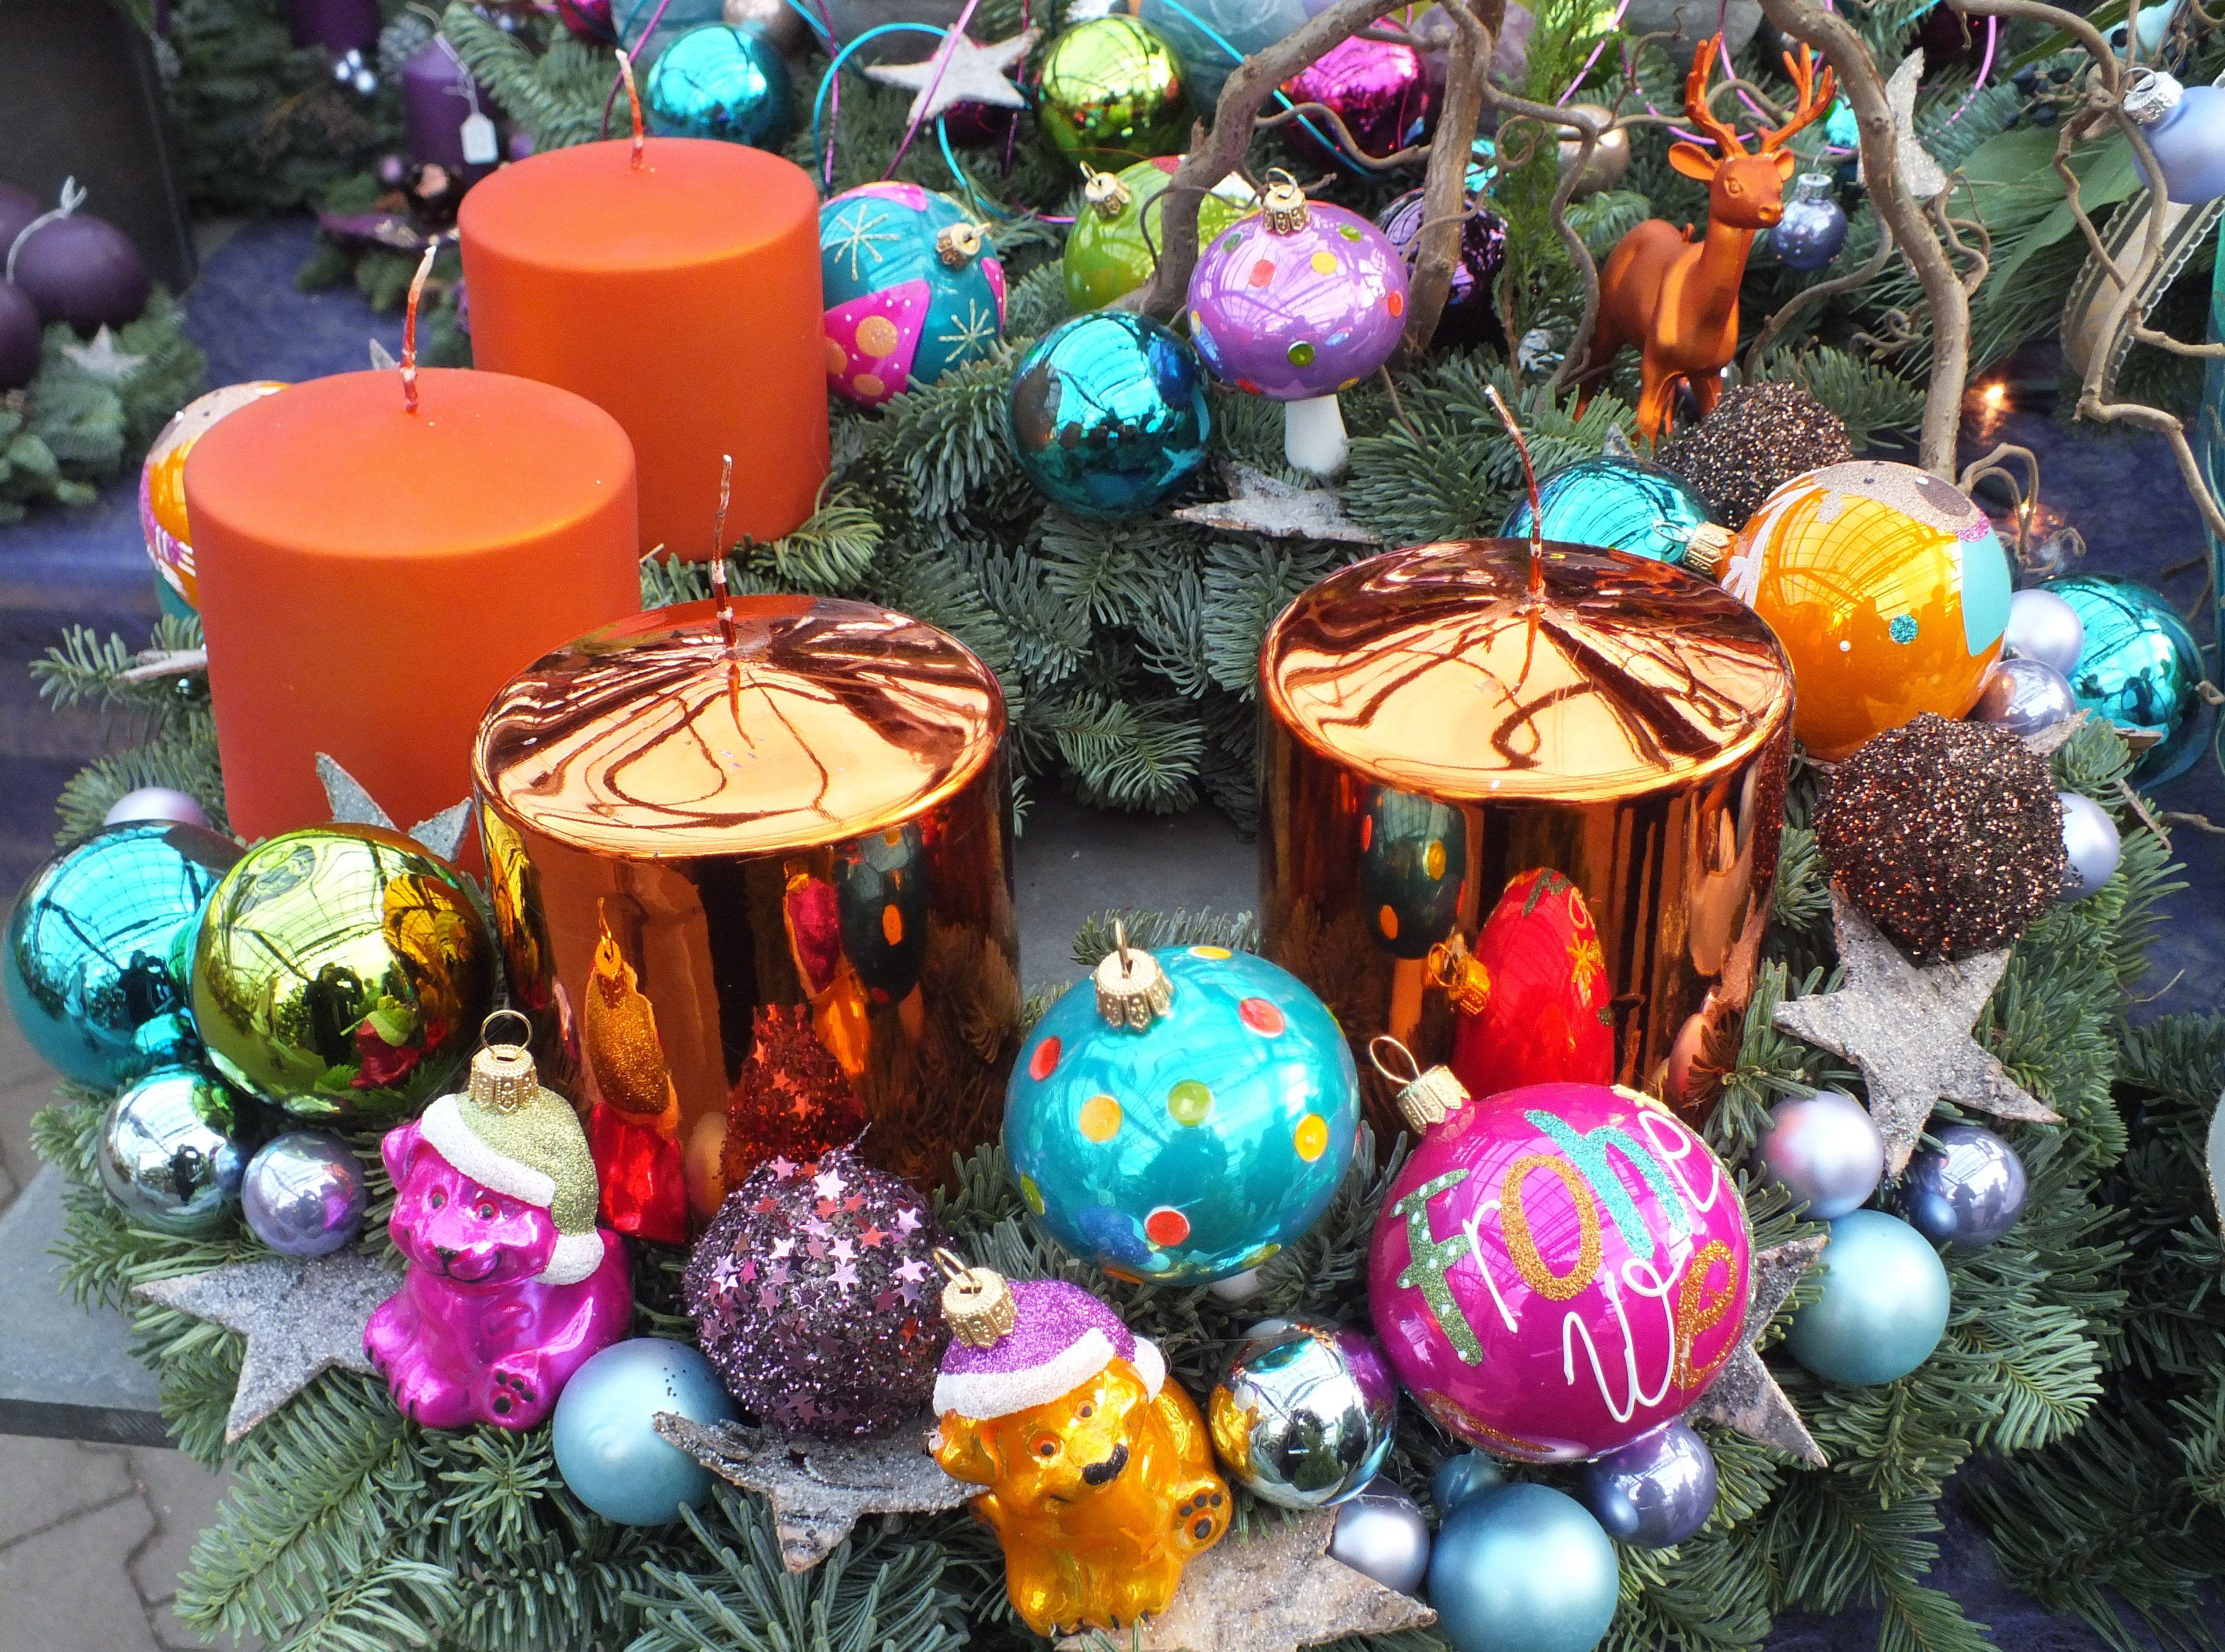 Bunte Deko, Weihnachten - Foto: S. Hopp